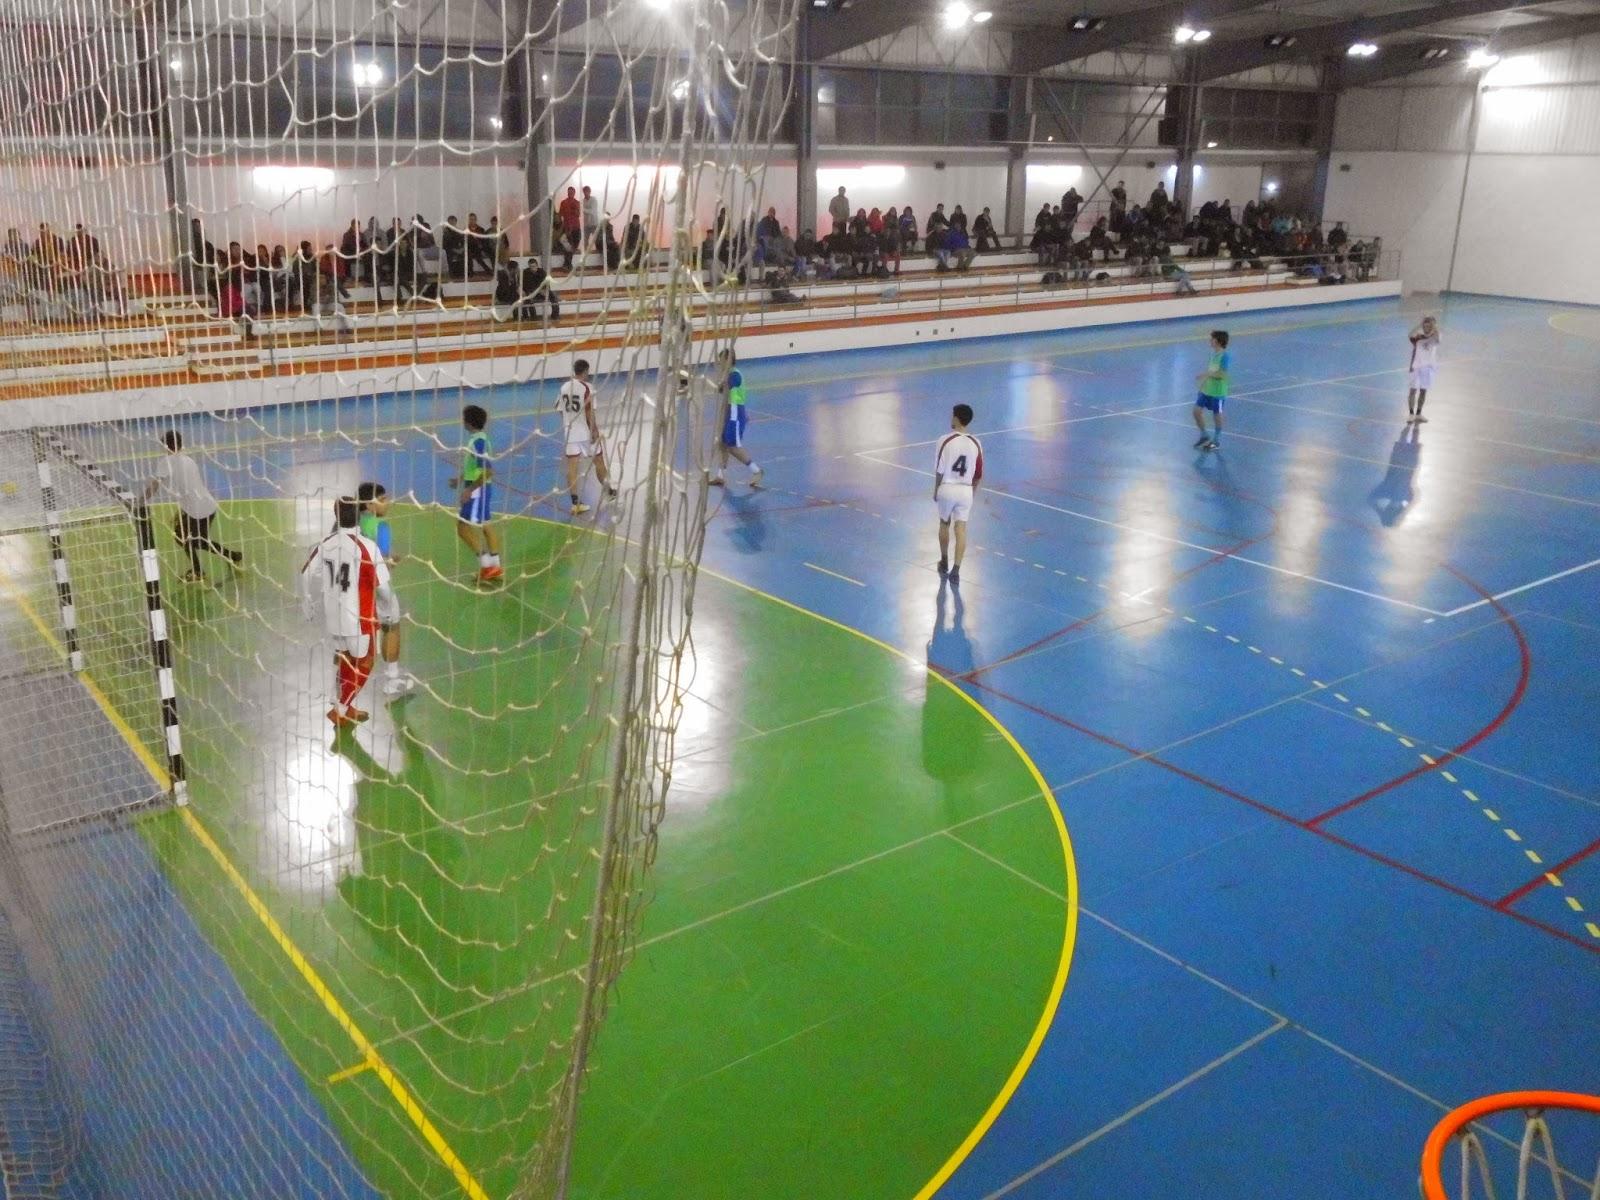 Barbus Futsal: Rescaldo do Torneio de Natal 24 Horas de Futsal #488225 1600x1200